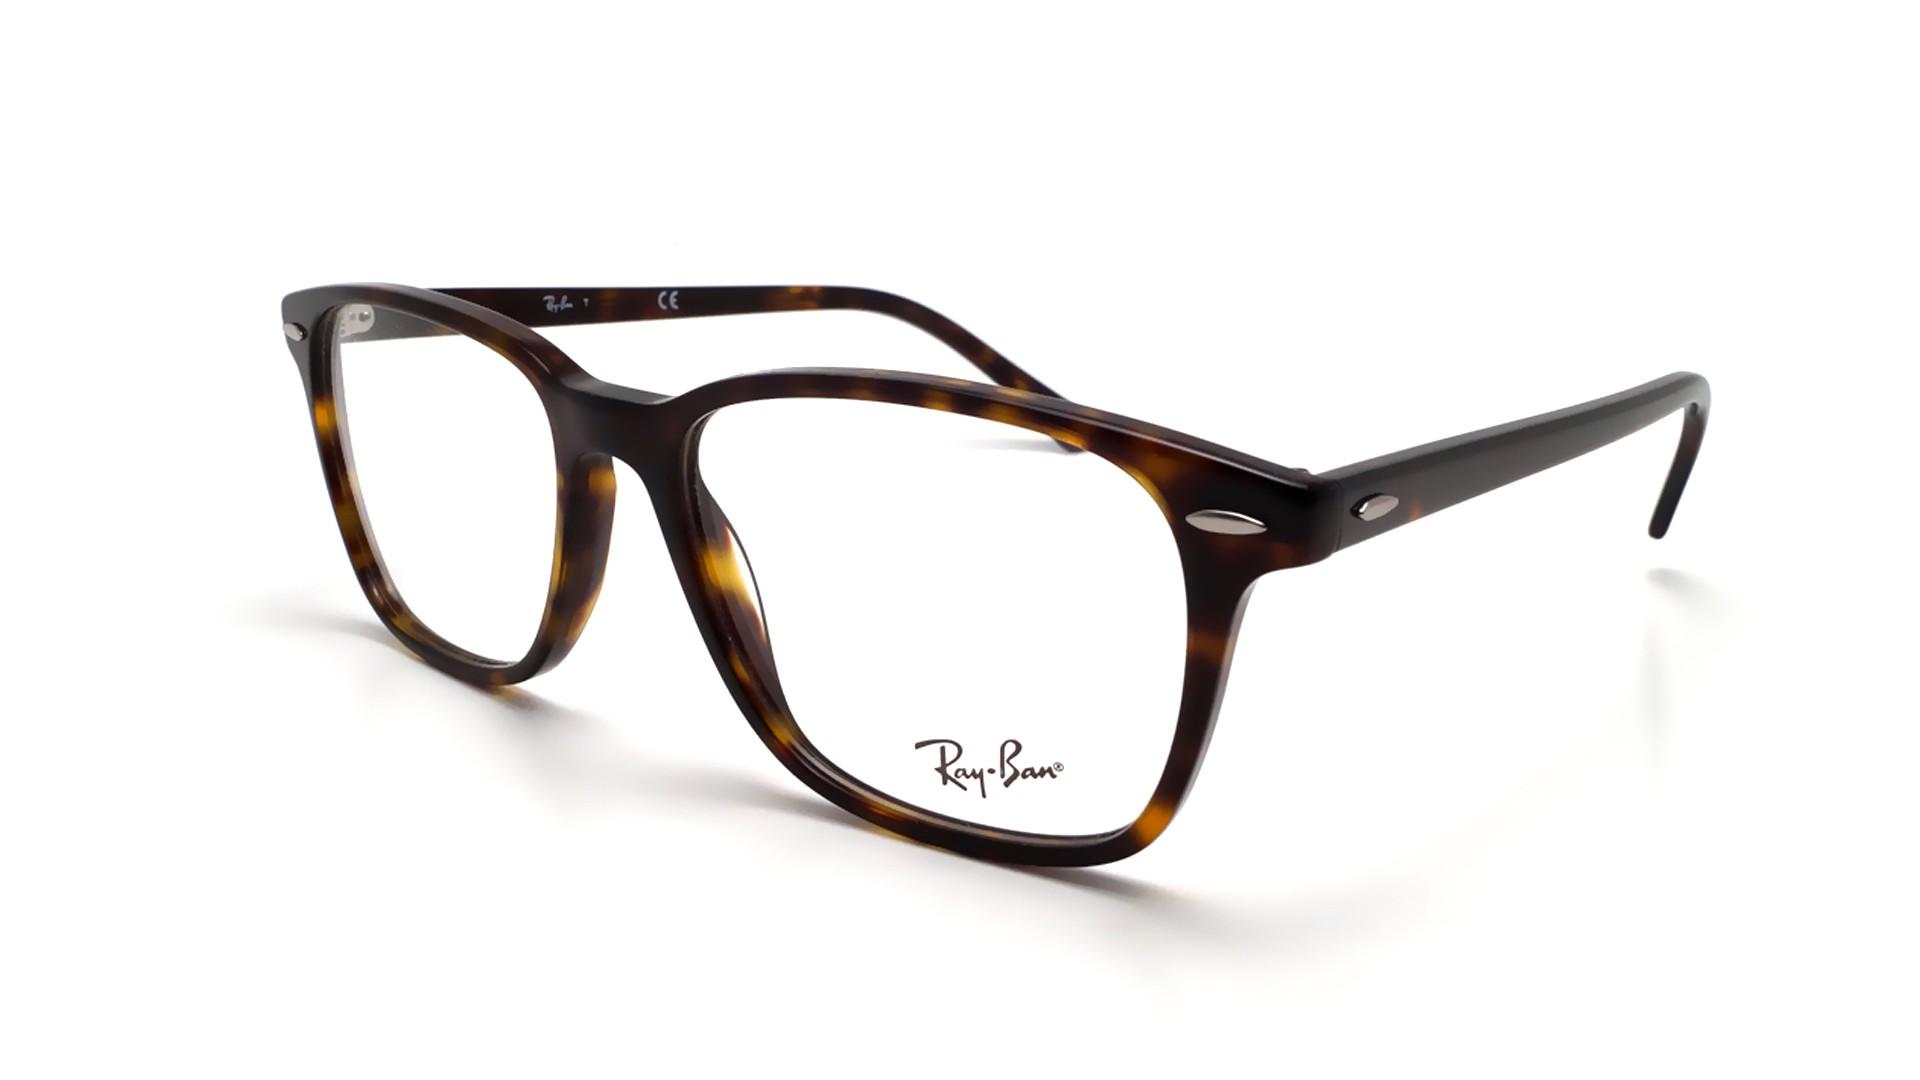 5b496714c8d Eyeglasses Ray-Ban RX7119 RB7119 2012 55-17 Tortoise Large